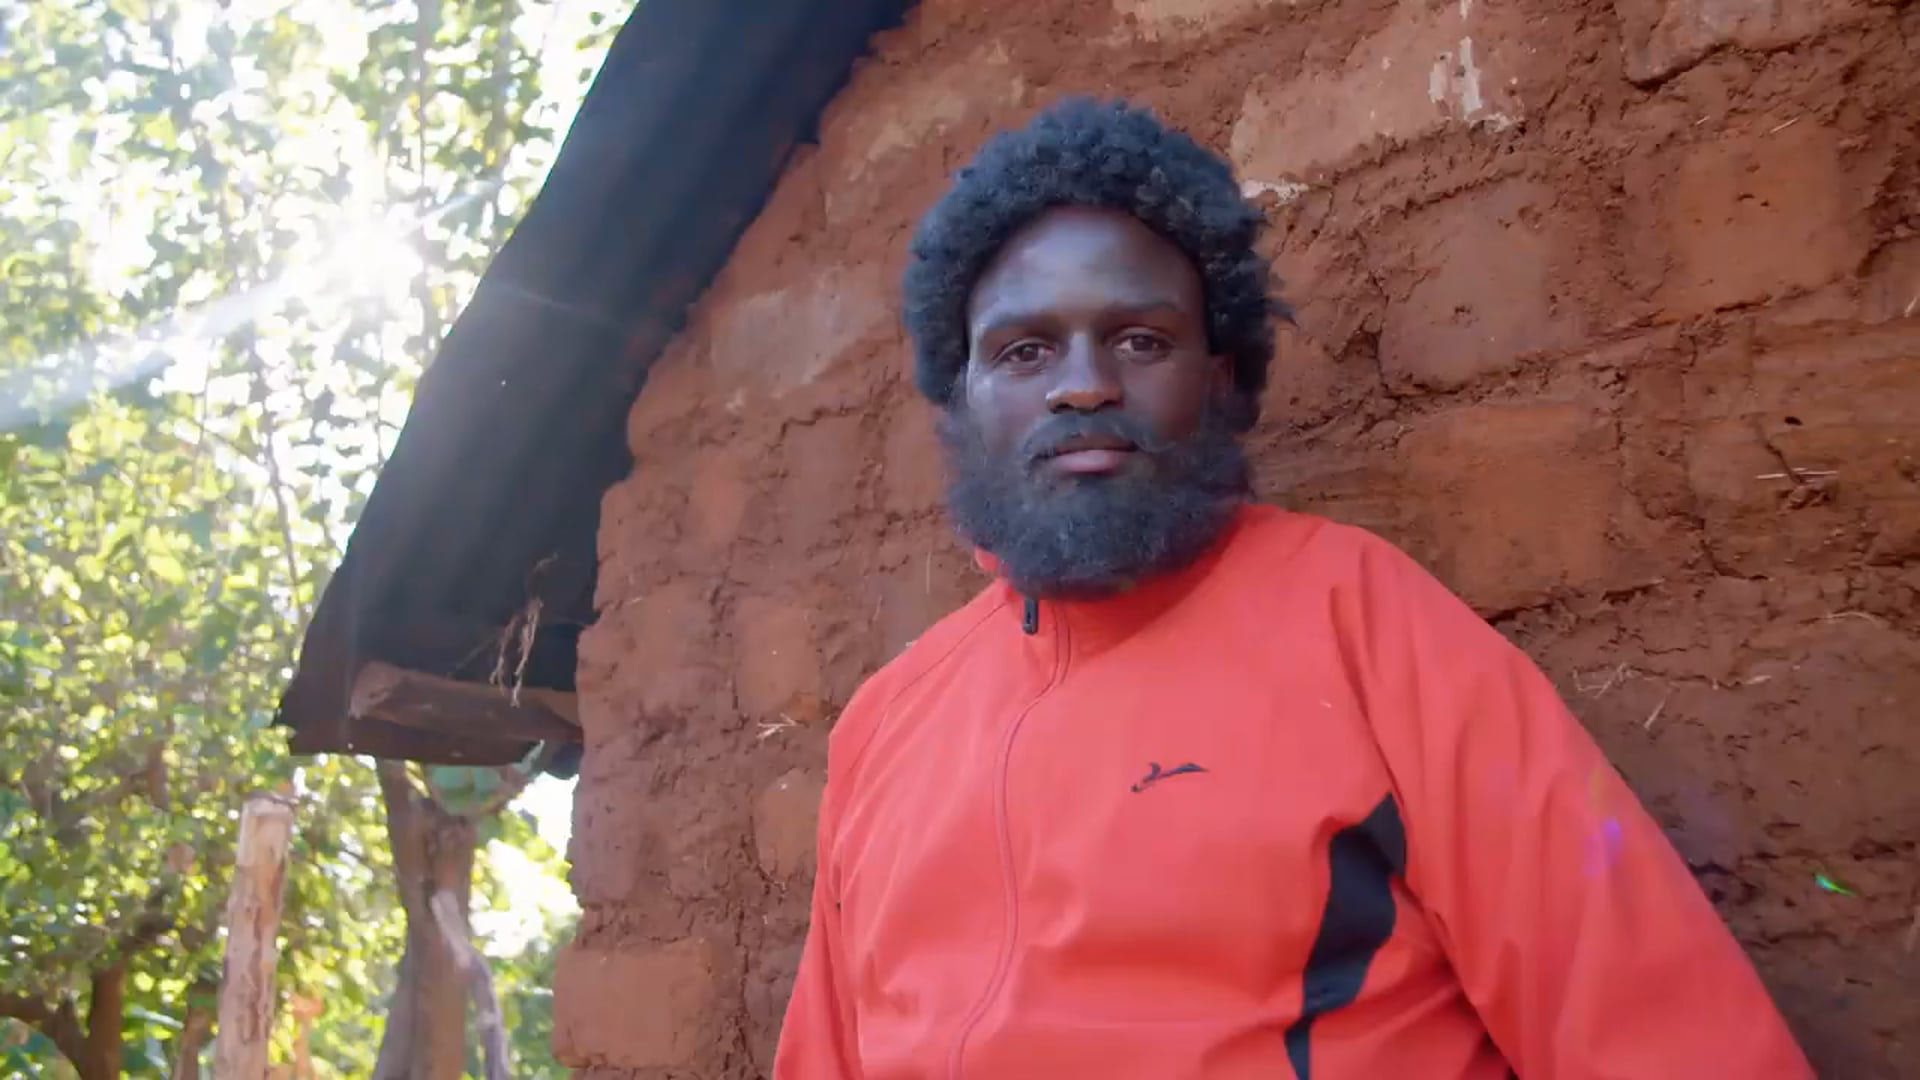 STATION 77: Mzee Mariga in Makuyu